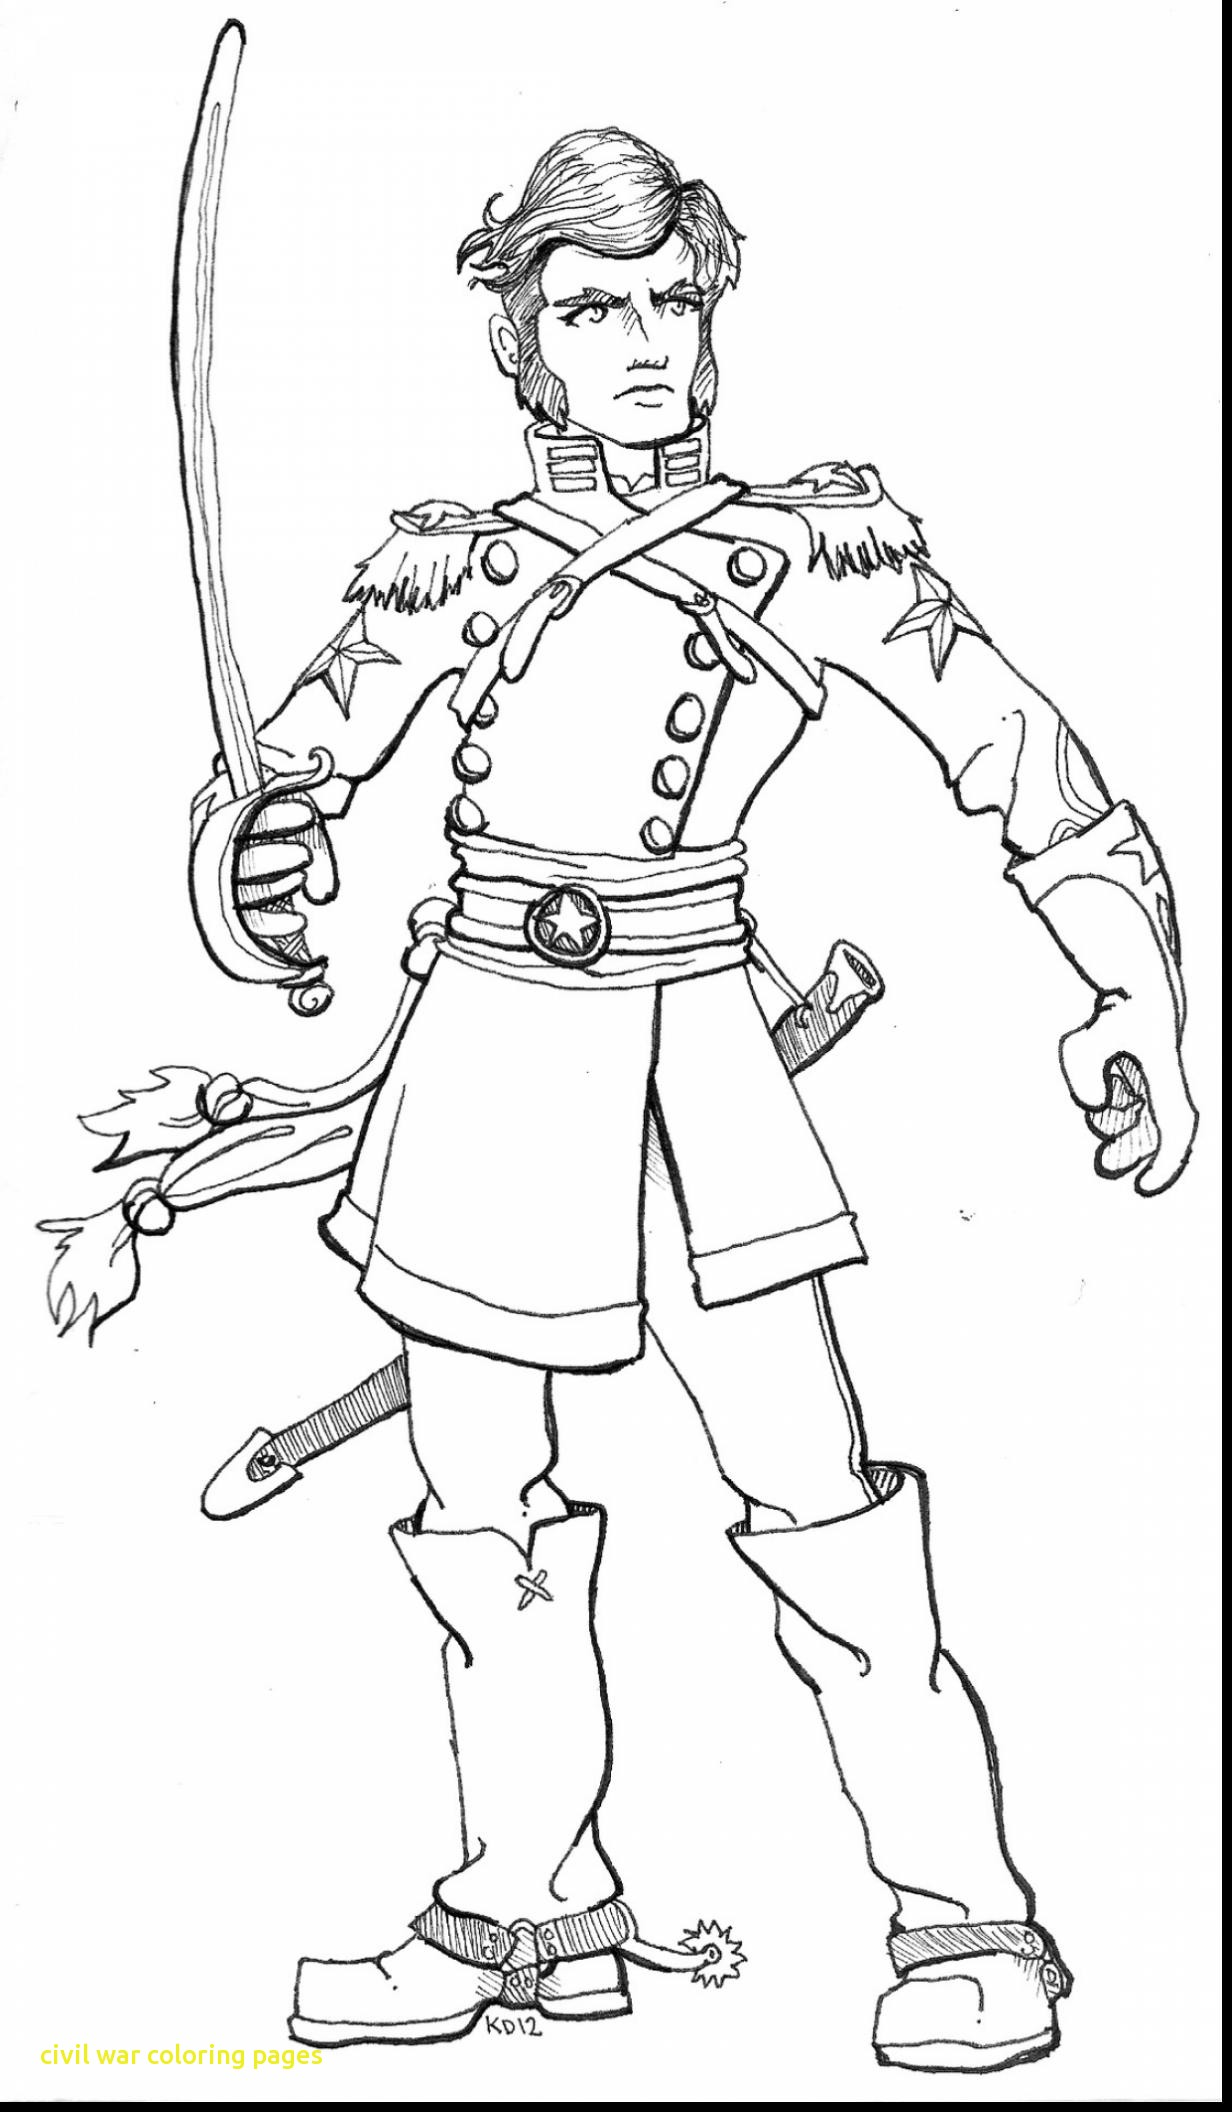 Civil War Coloring Pages For Kids. civil war coloring pages pdf ... | 2112x1232